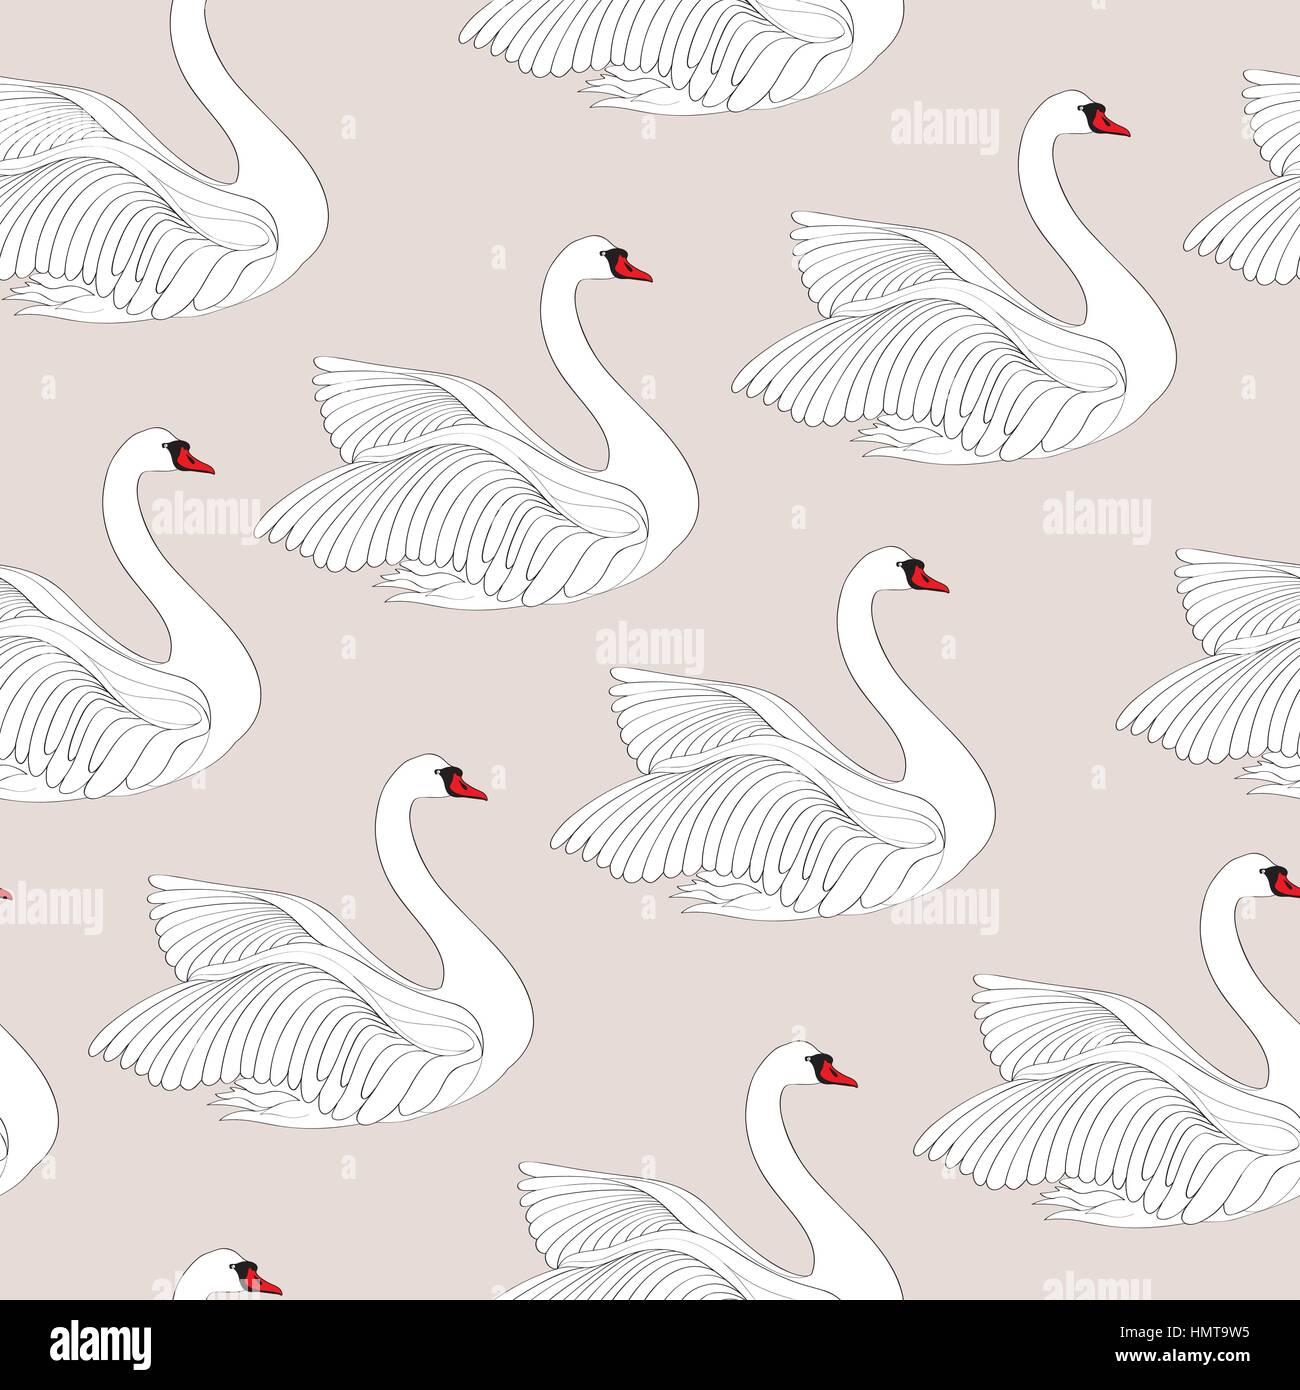 White bird swan seamless pattern. Wed gentle background - Stock Image